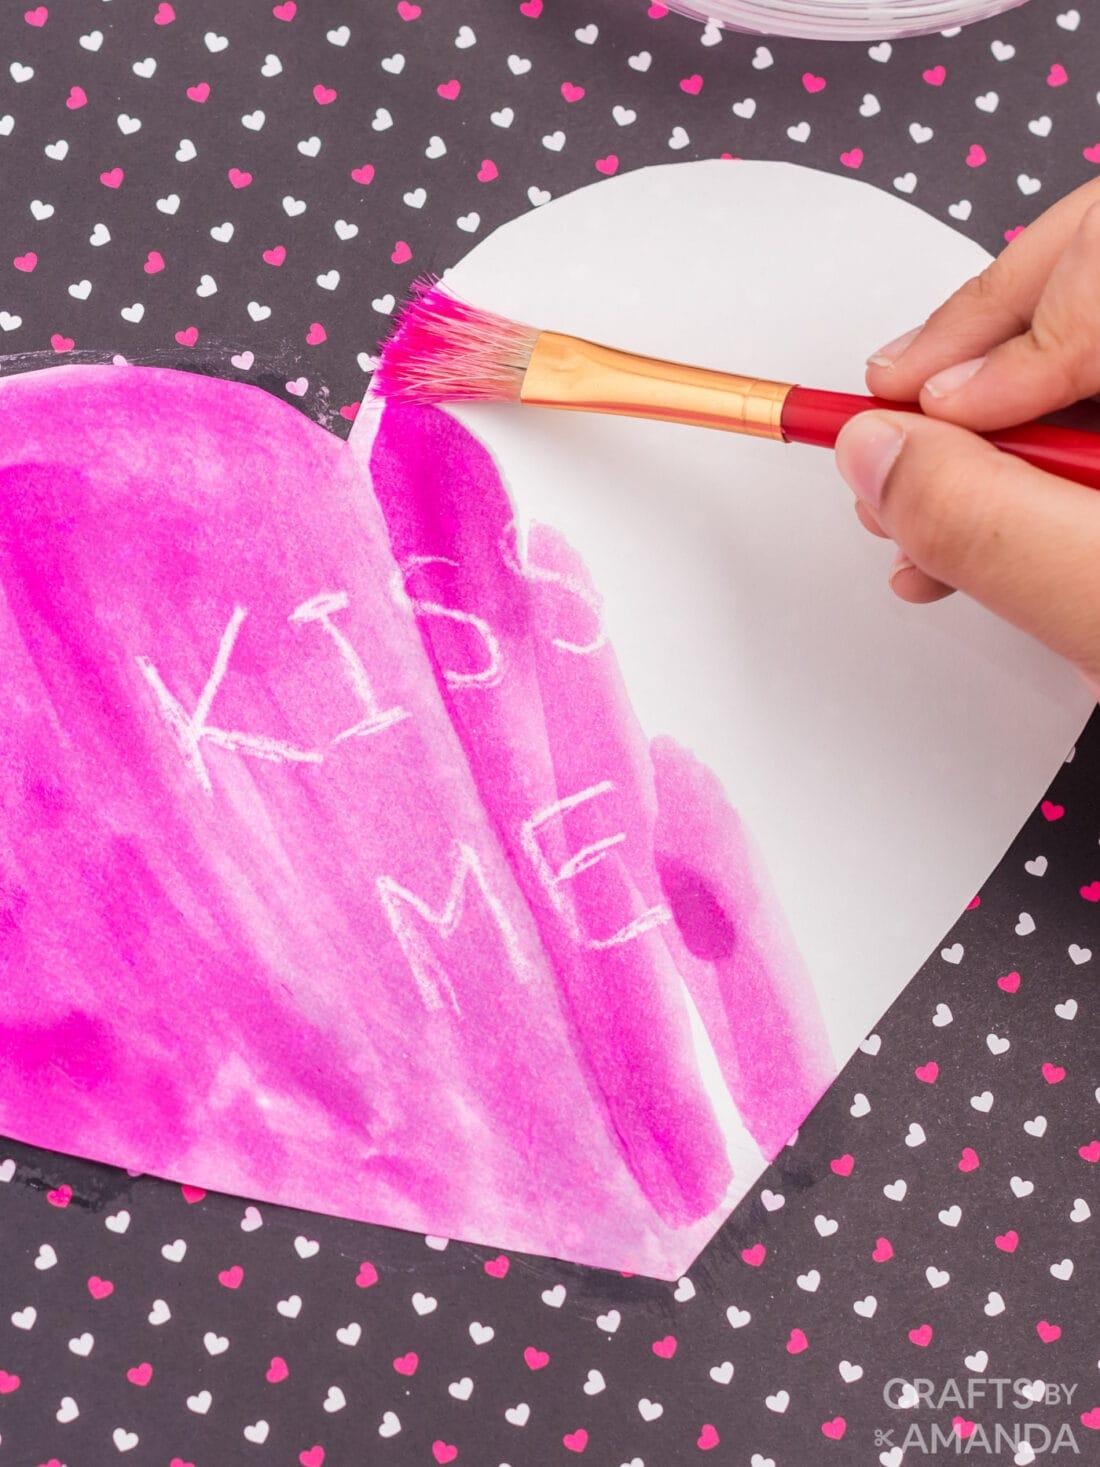 painting a heart shape